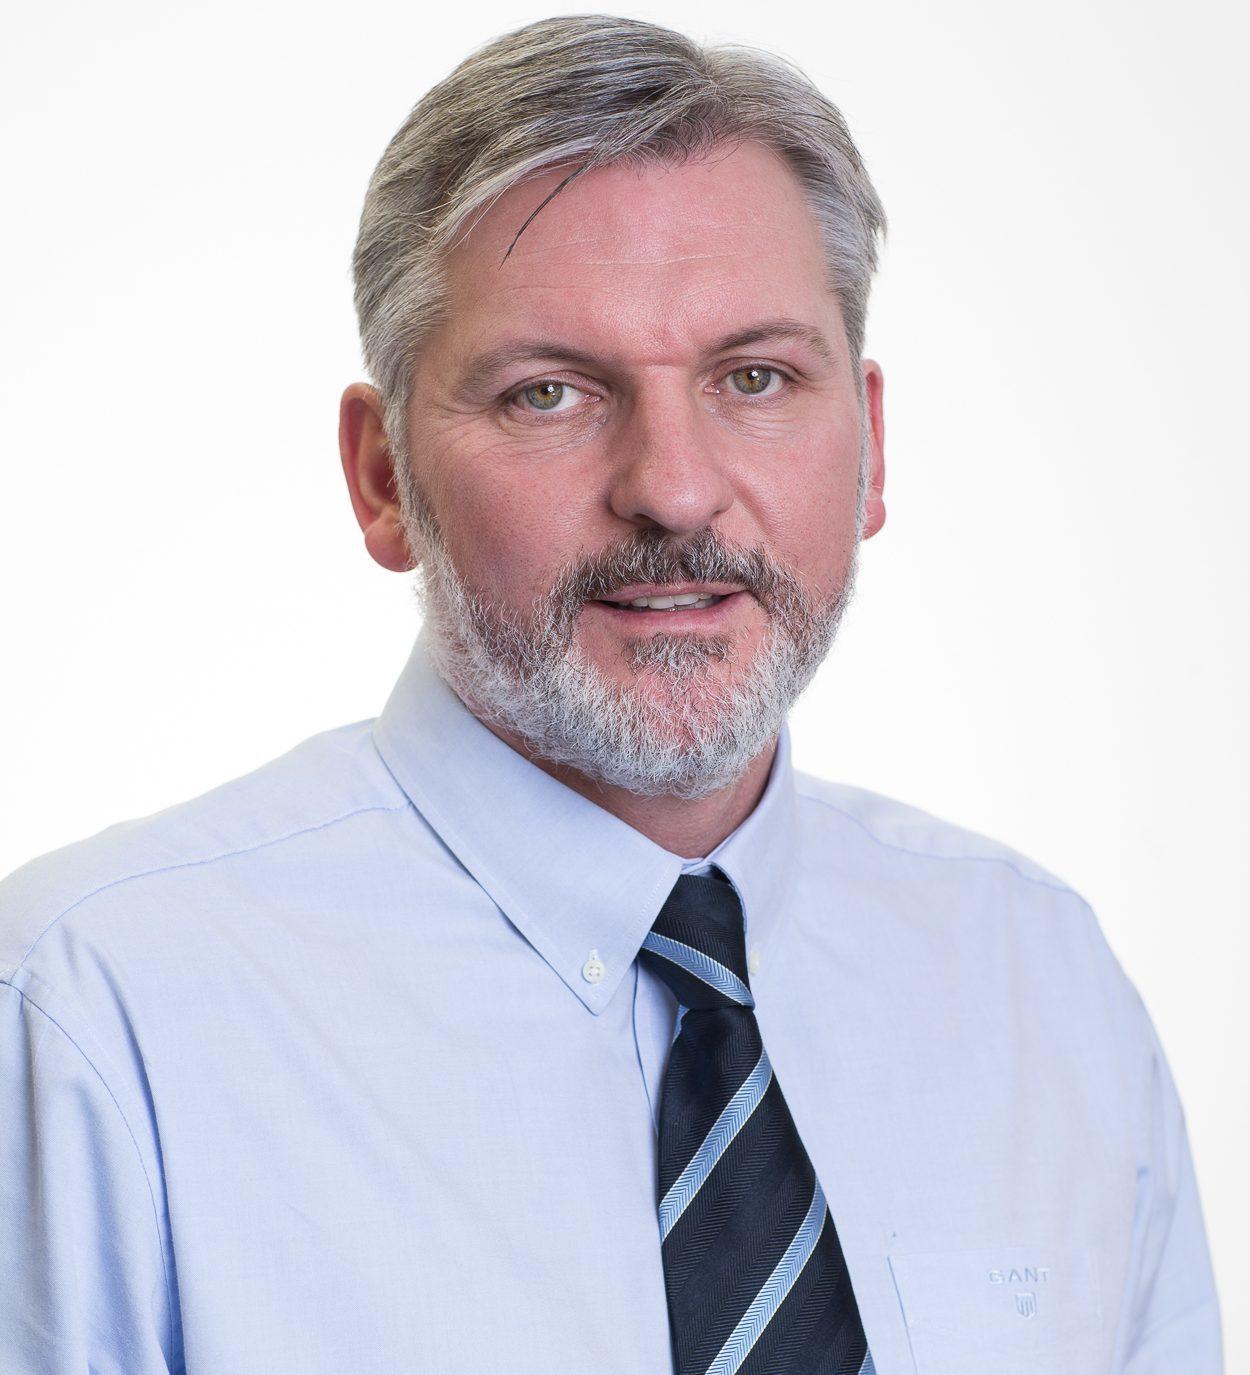 Derek Smith, chief executive of Ramco